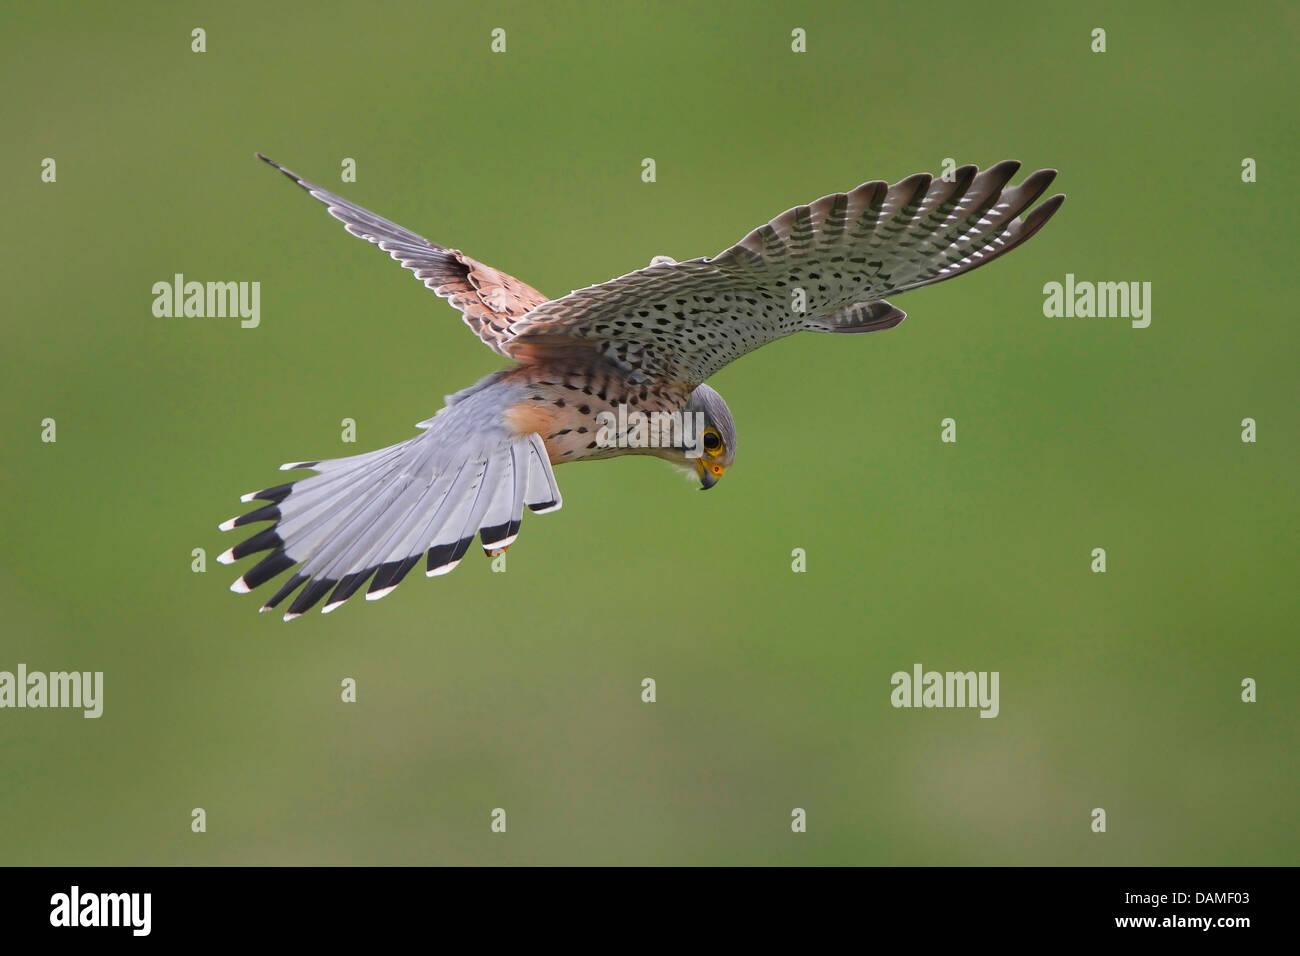 common kestrel (Falco tinnunculus), hovering in the air for capturing prey, Belgium - Stock Image